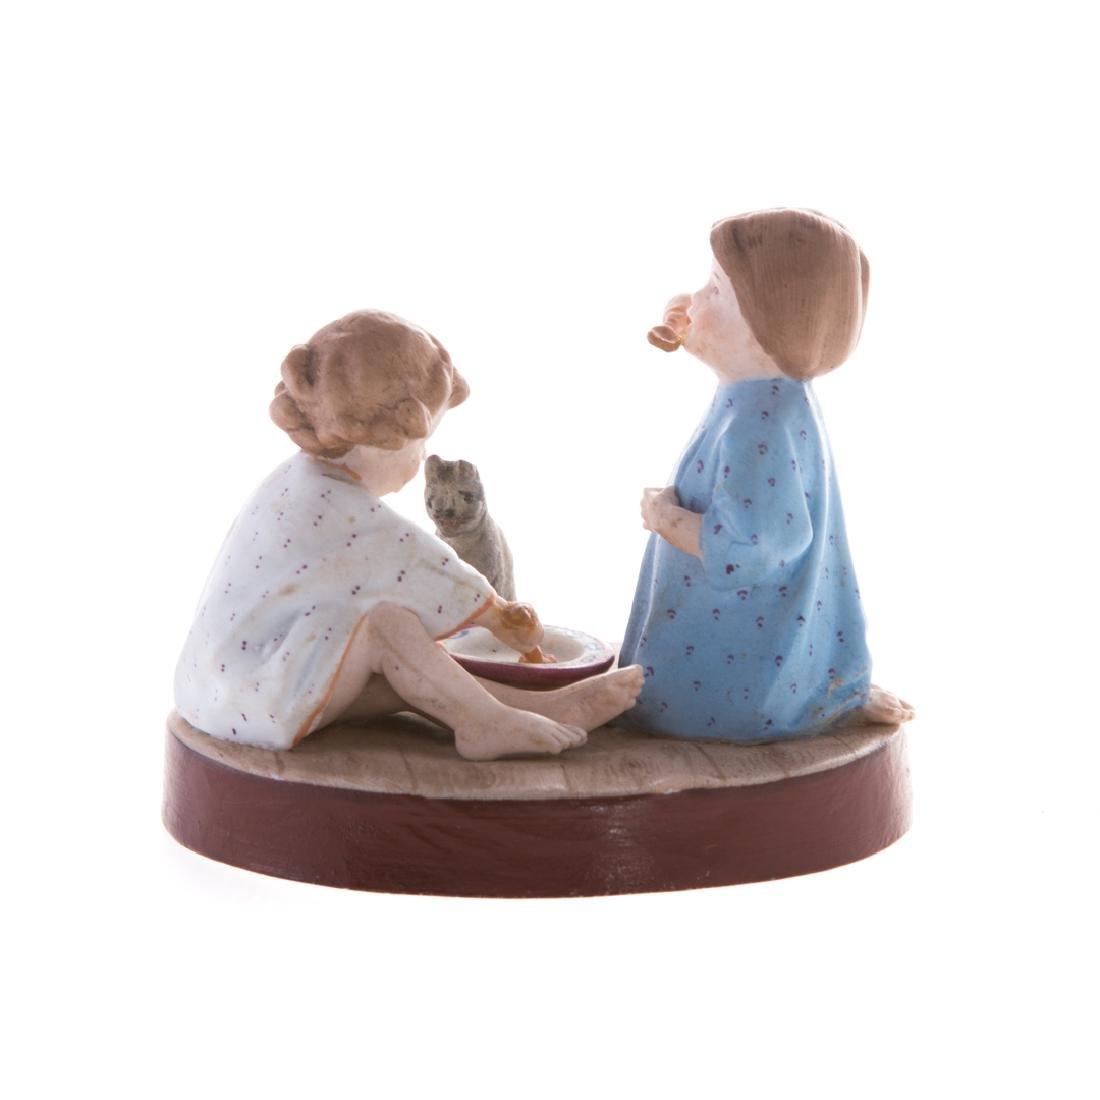 Gardner Imperial Russian porcelain figure - 2